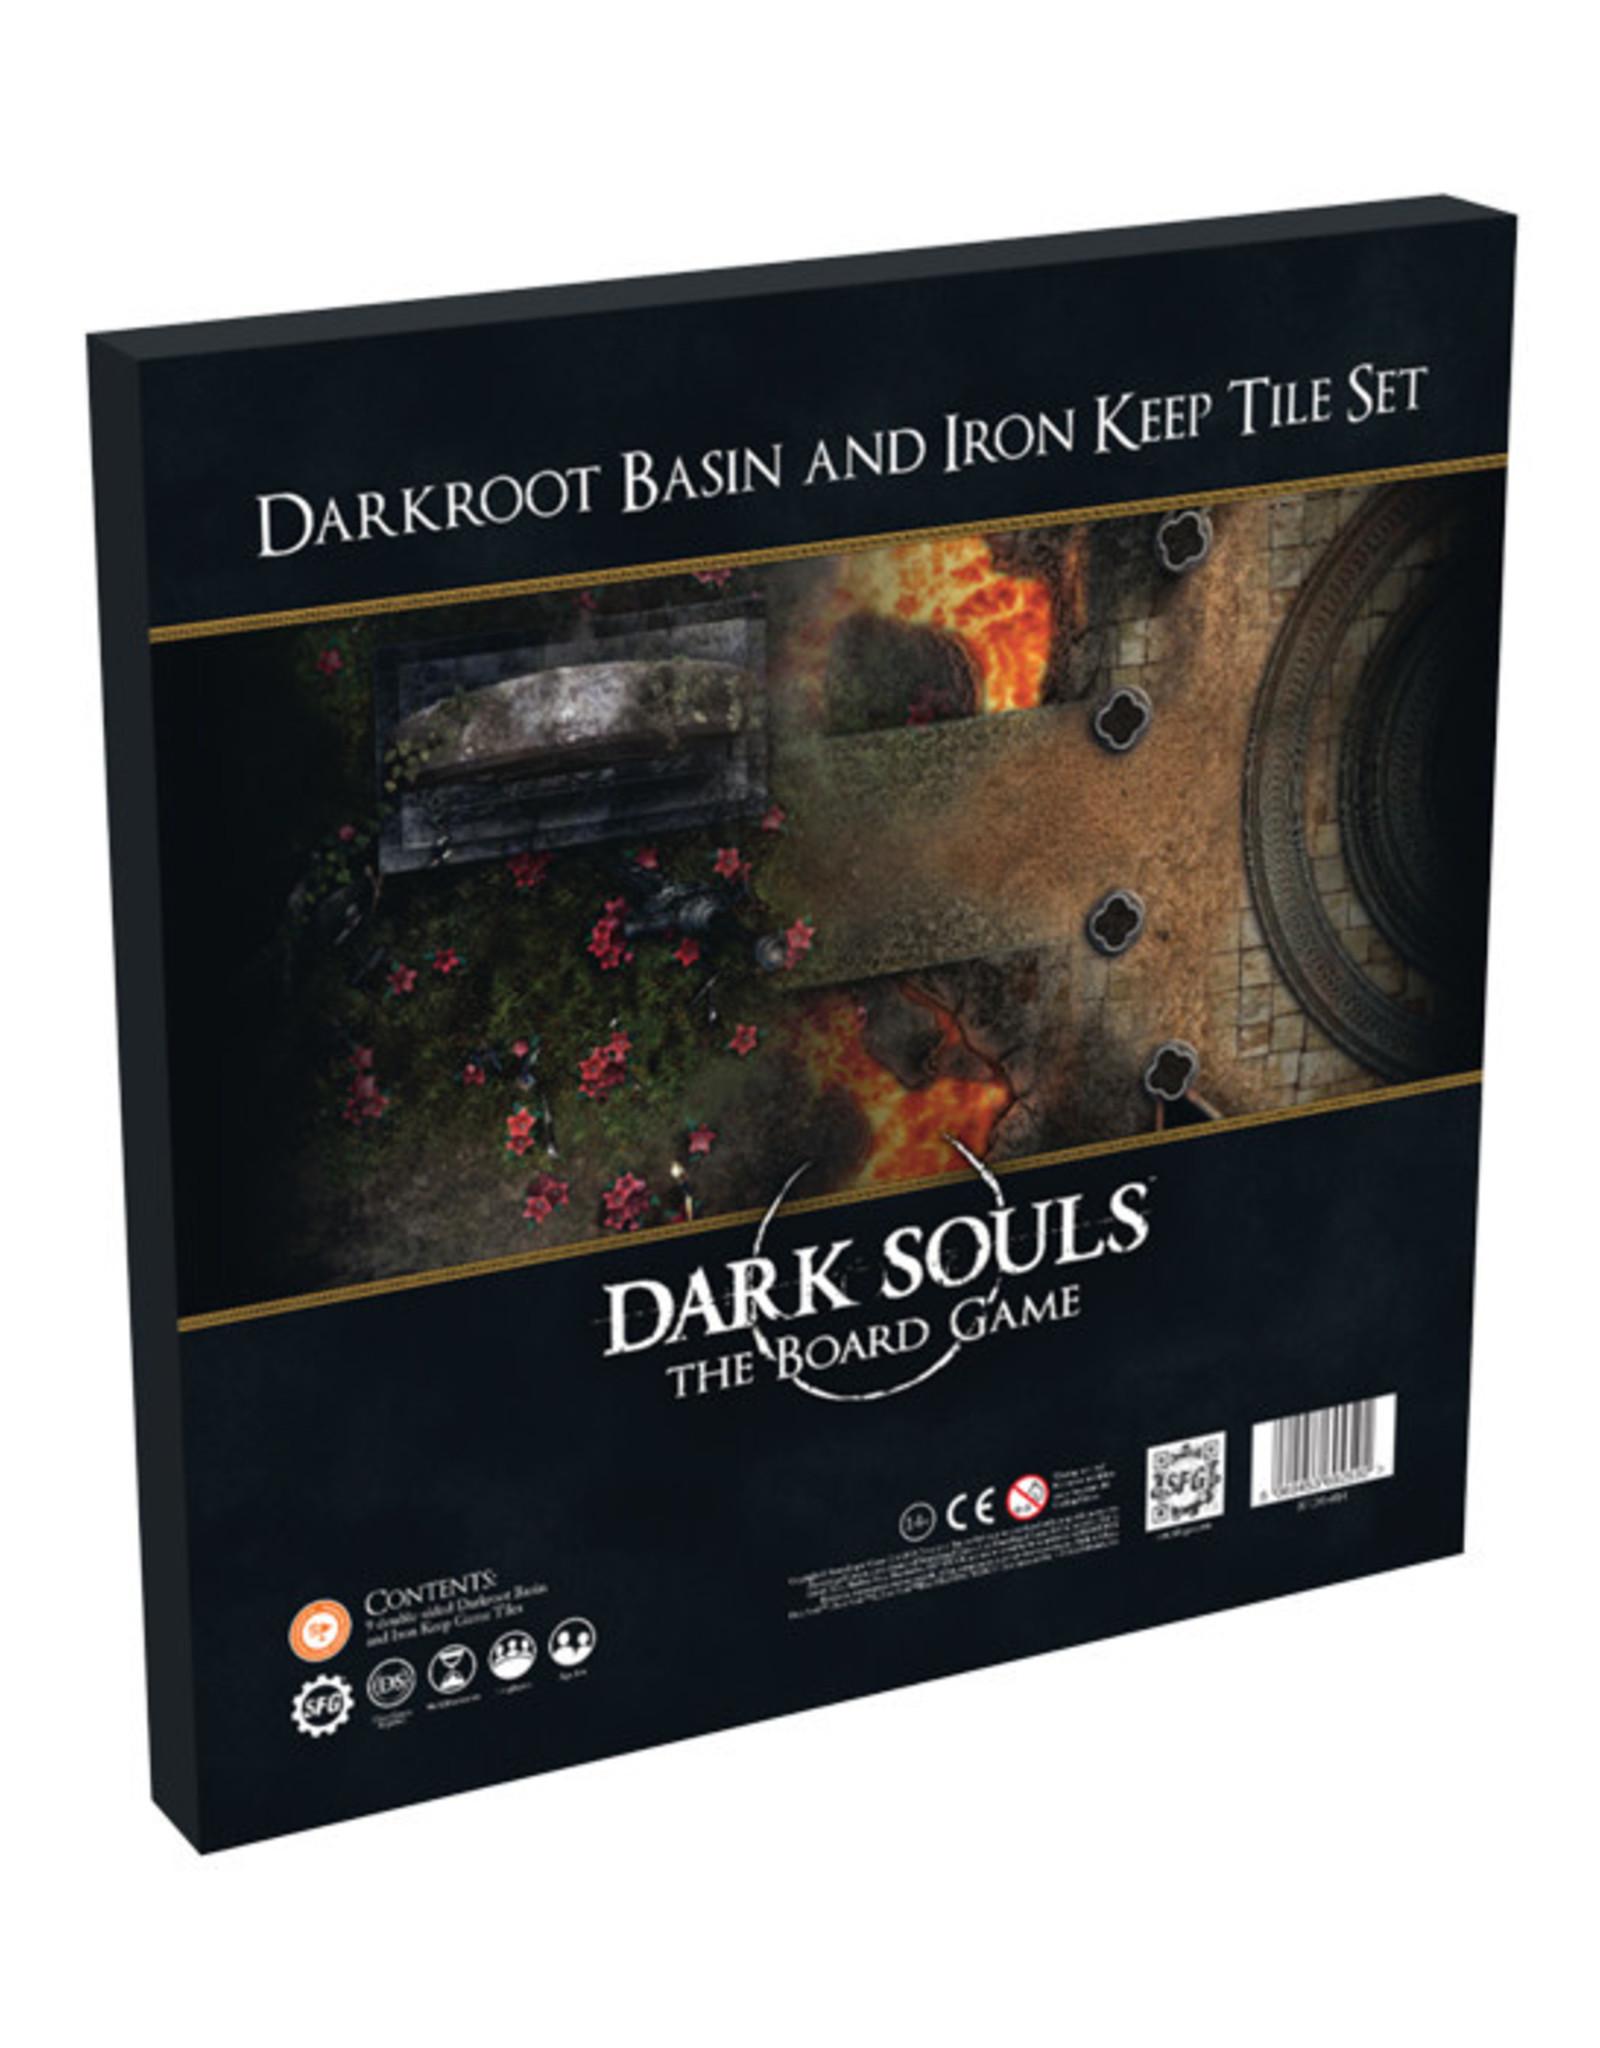 Dark Souls: The Board Game - Tile Set - Darkroot Basin and Iron Keep